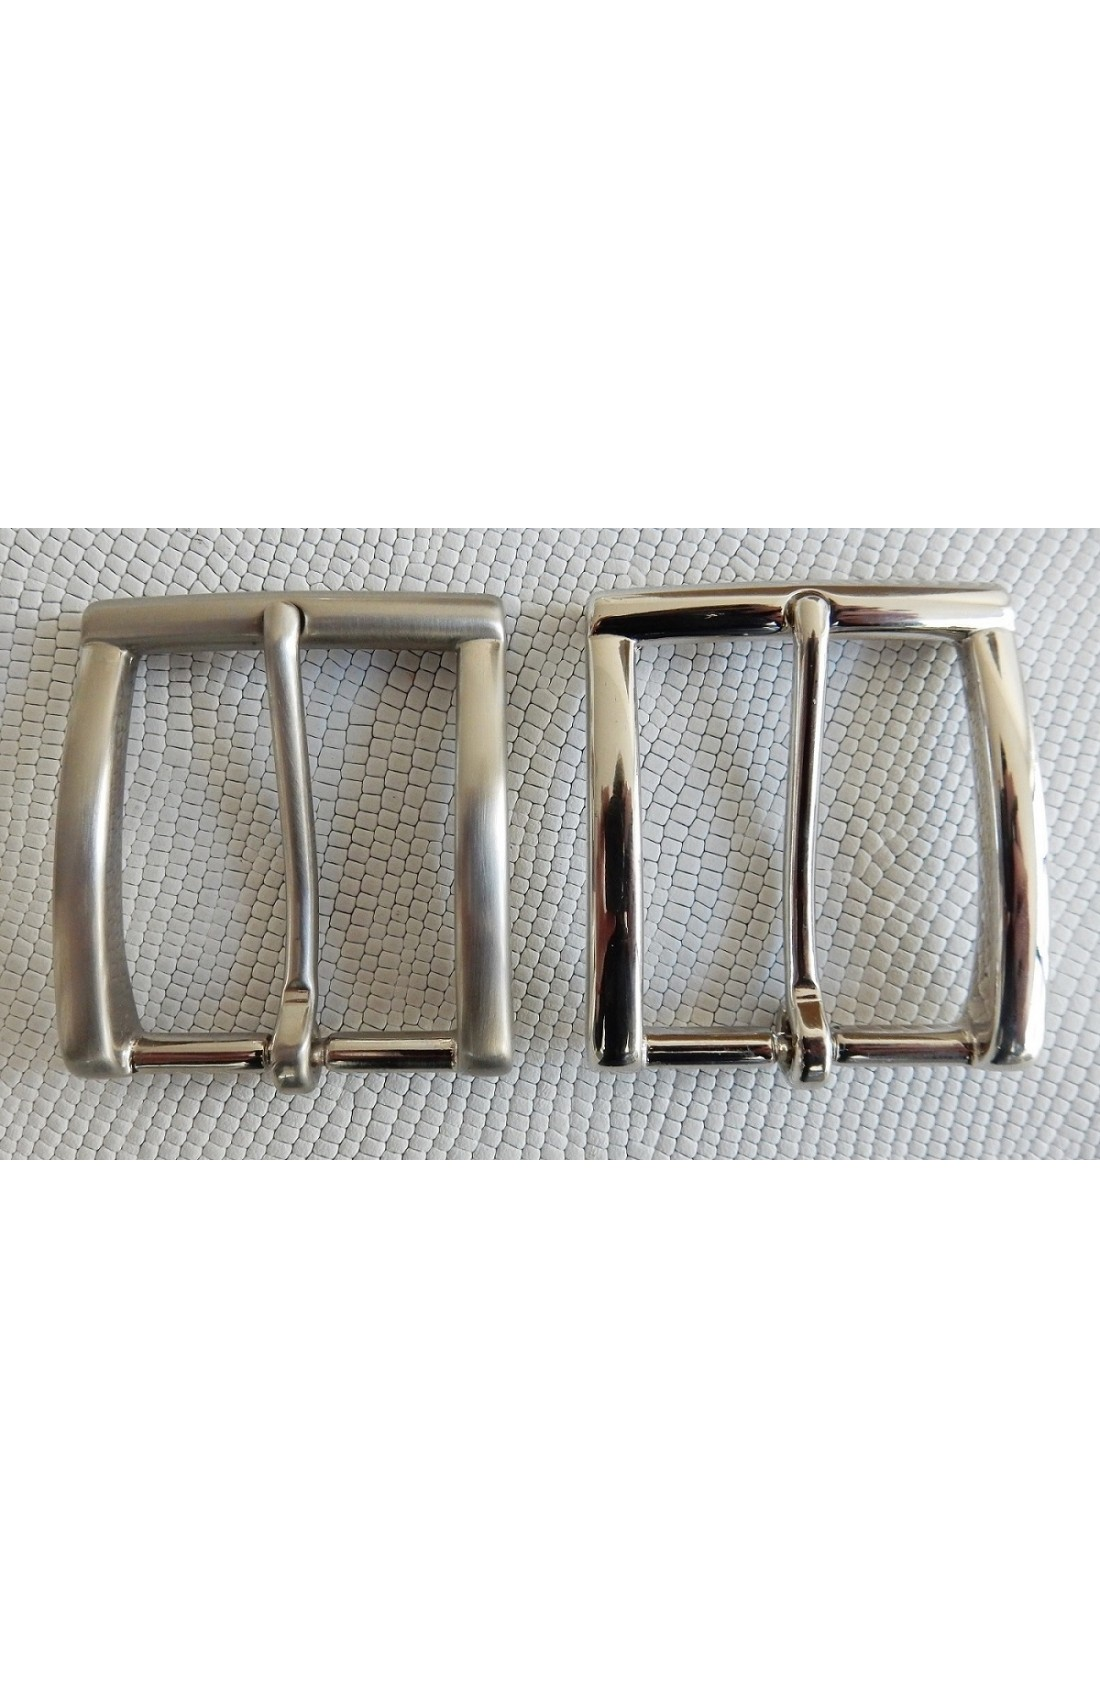 Fibbia Standard I 113 mm.35 nikel e nikel satinato (1)